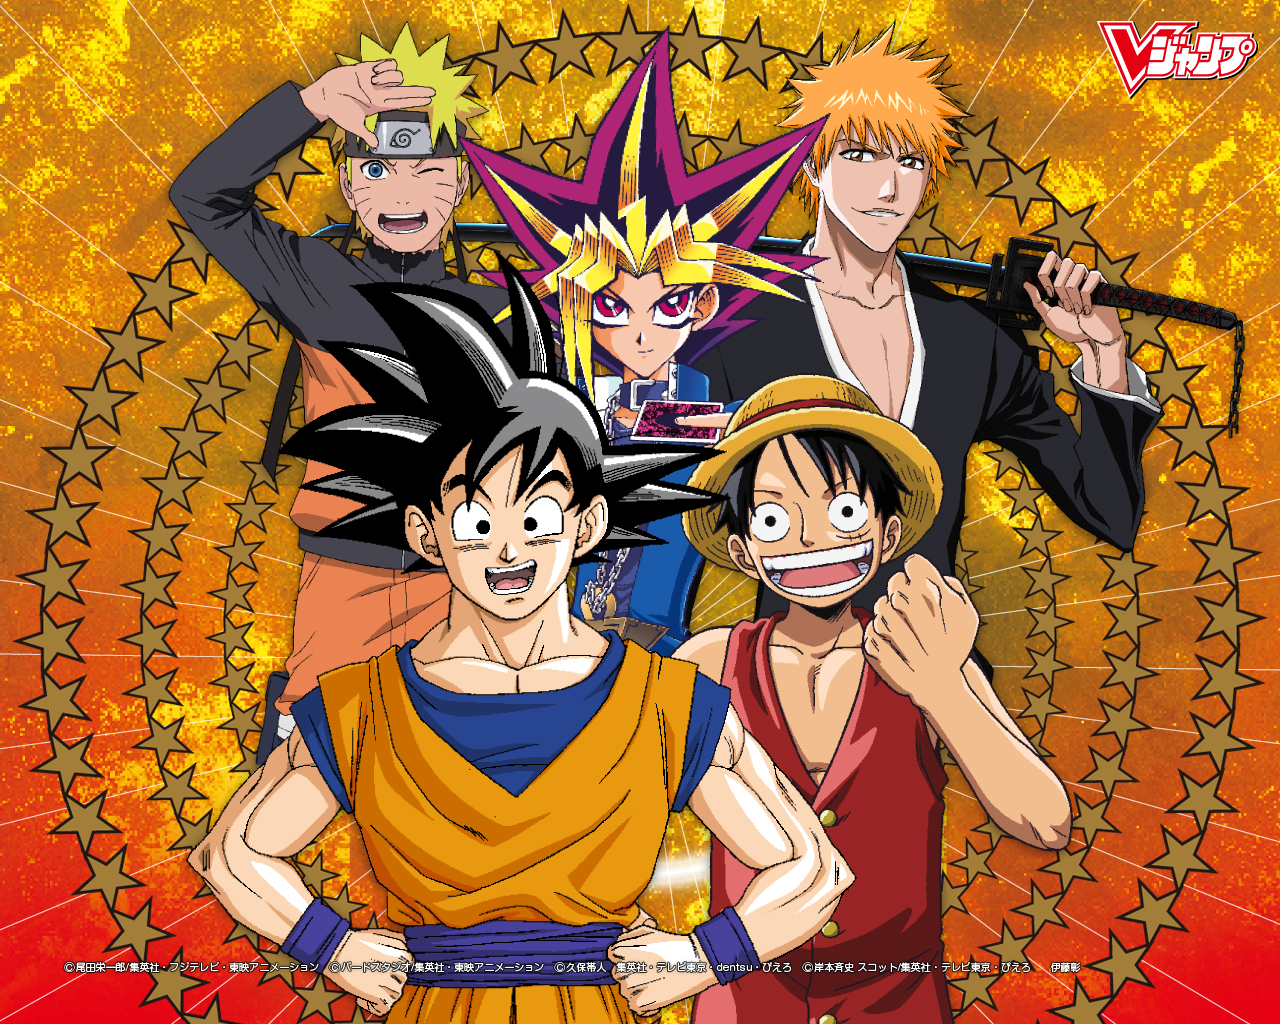 Fantastic Wallpaper Naruto Dbz - Cross-Over  Snapshot_85665.jpg